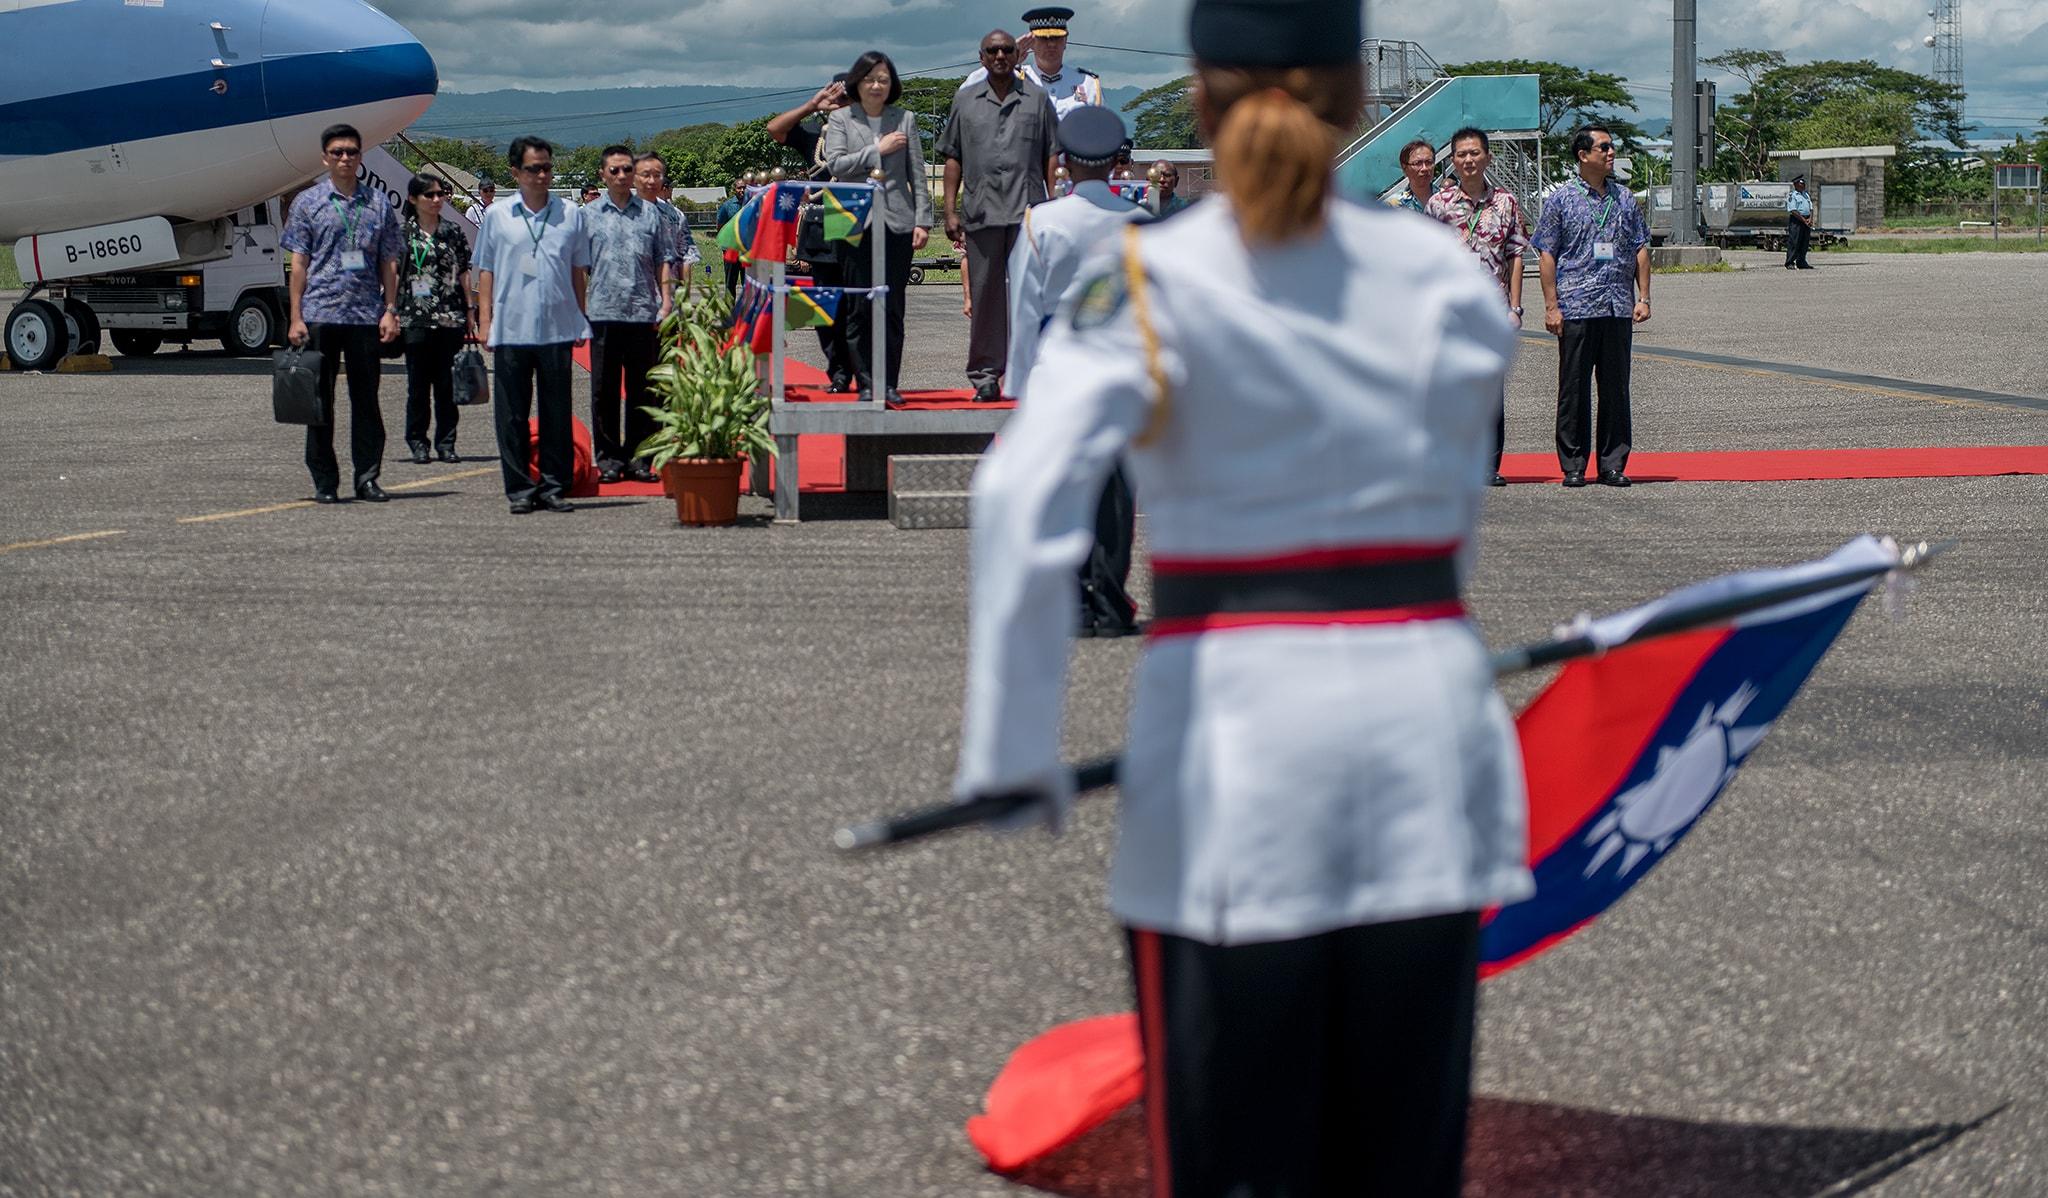 Taiwan's President Tsai Ing-wen arrives in Solomon Islands in November (Photo: Taiwan Presidential office/Flickr)